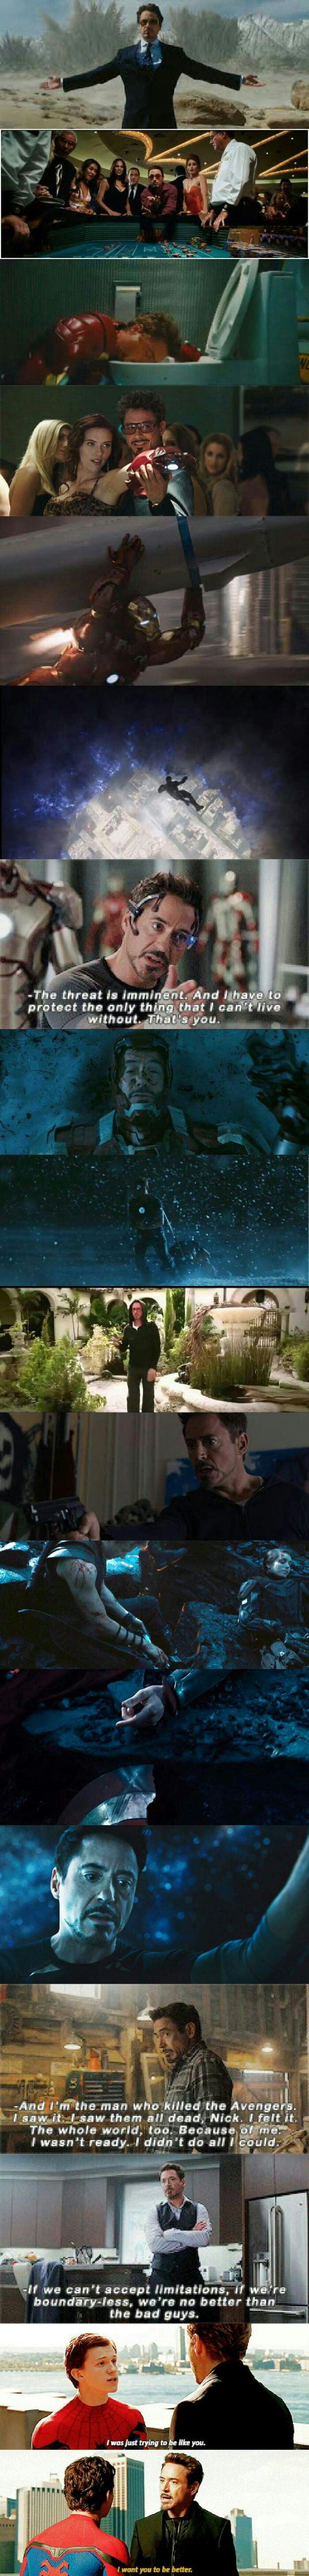 Tony Stark's character development